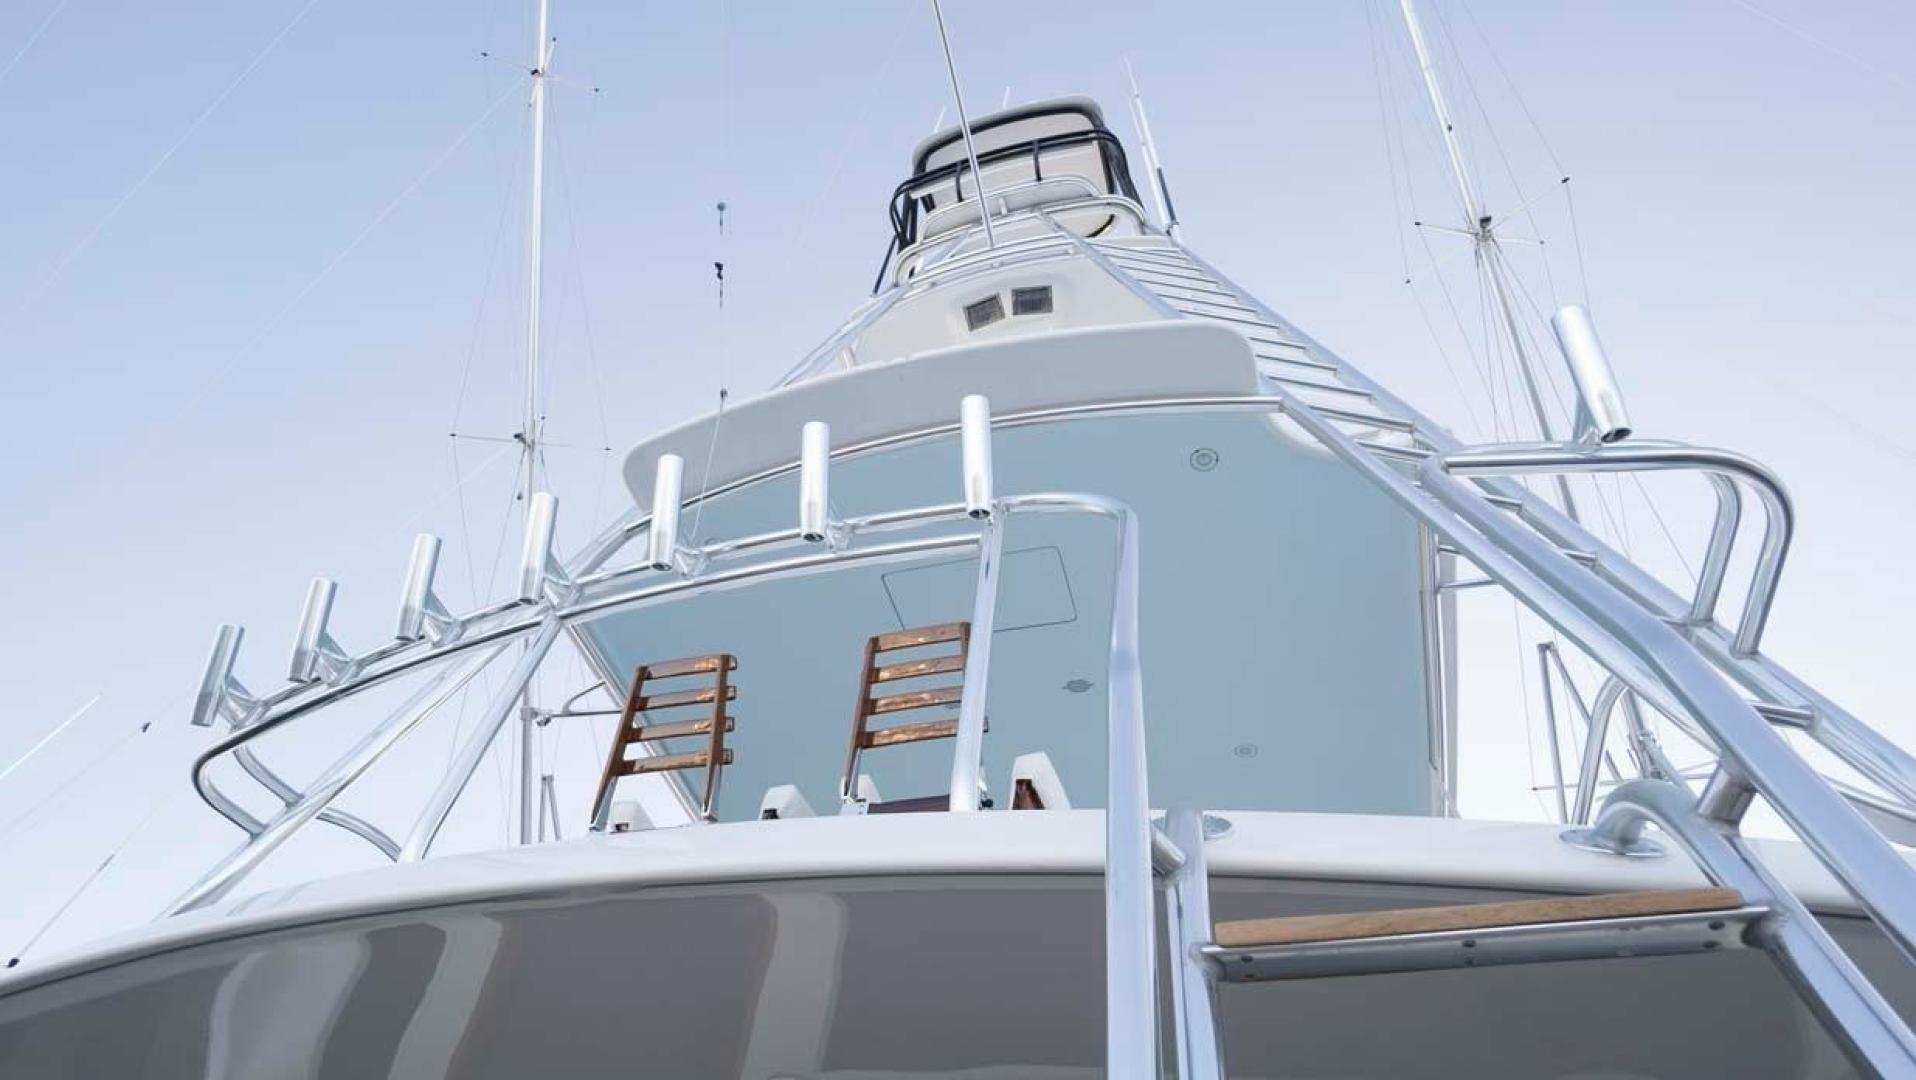 Jim-Smith-Custom-Convertible-Sportfish-2006-Silky-Palm-Beach-Florida-United-States-Rod-Holders-924603